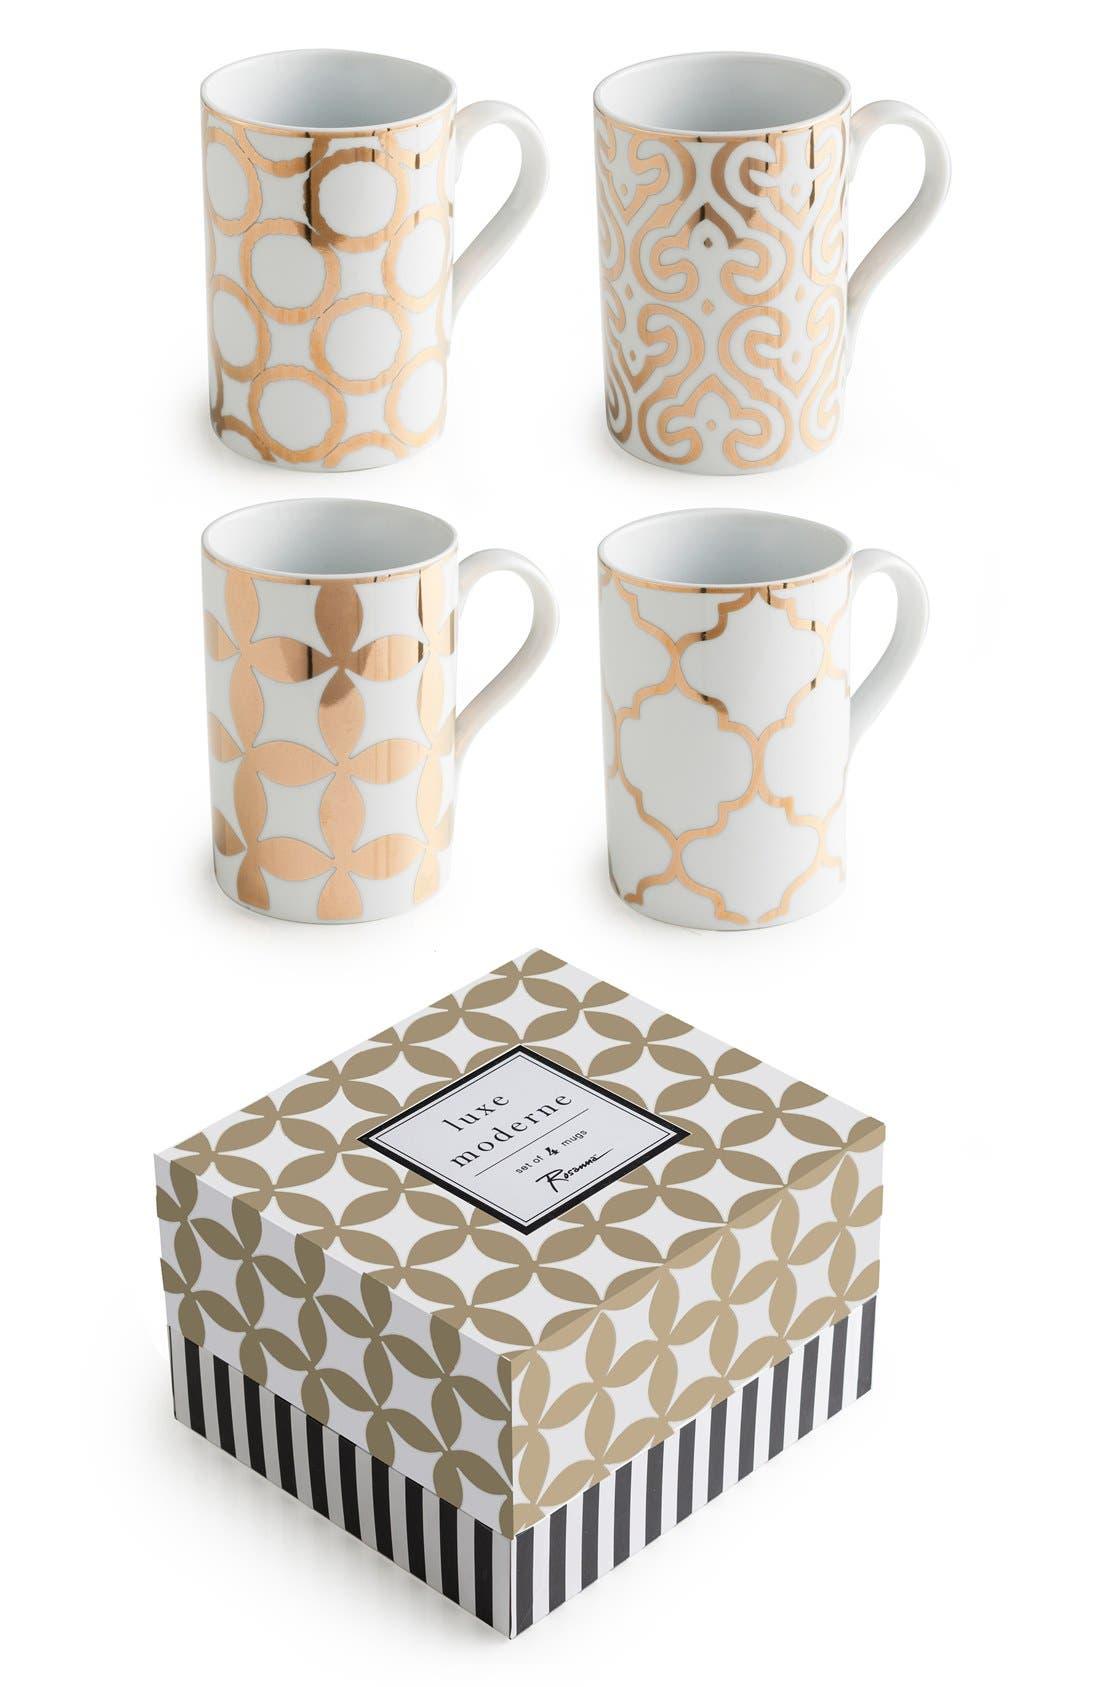 Rosanna 'Luxe Moderne' Coffee Mugs (Set of 4)